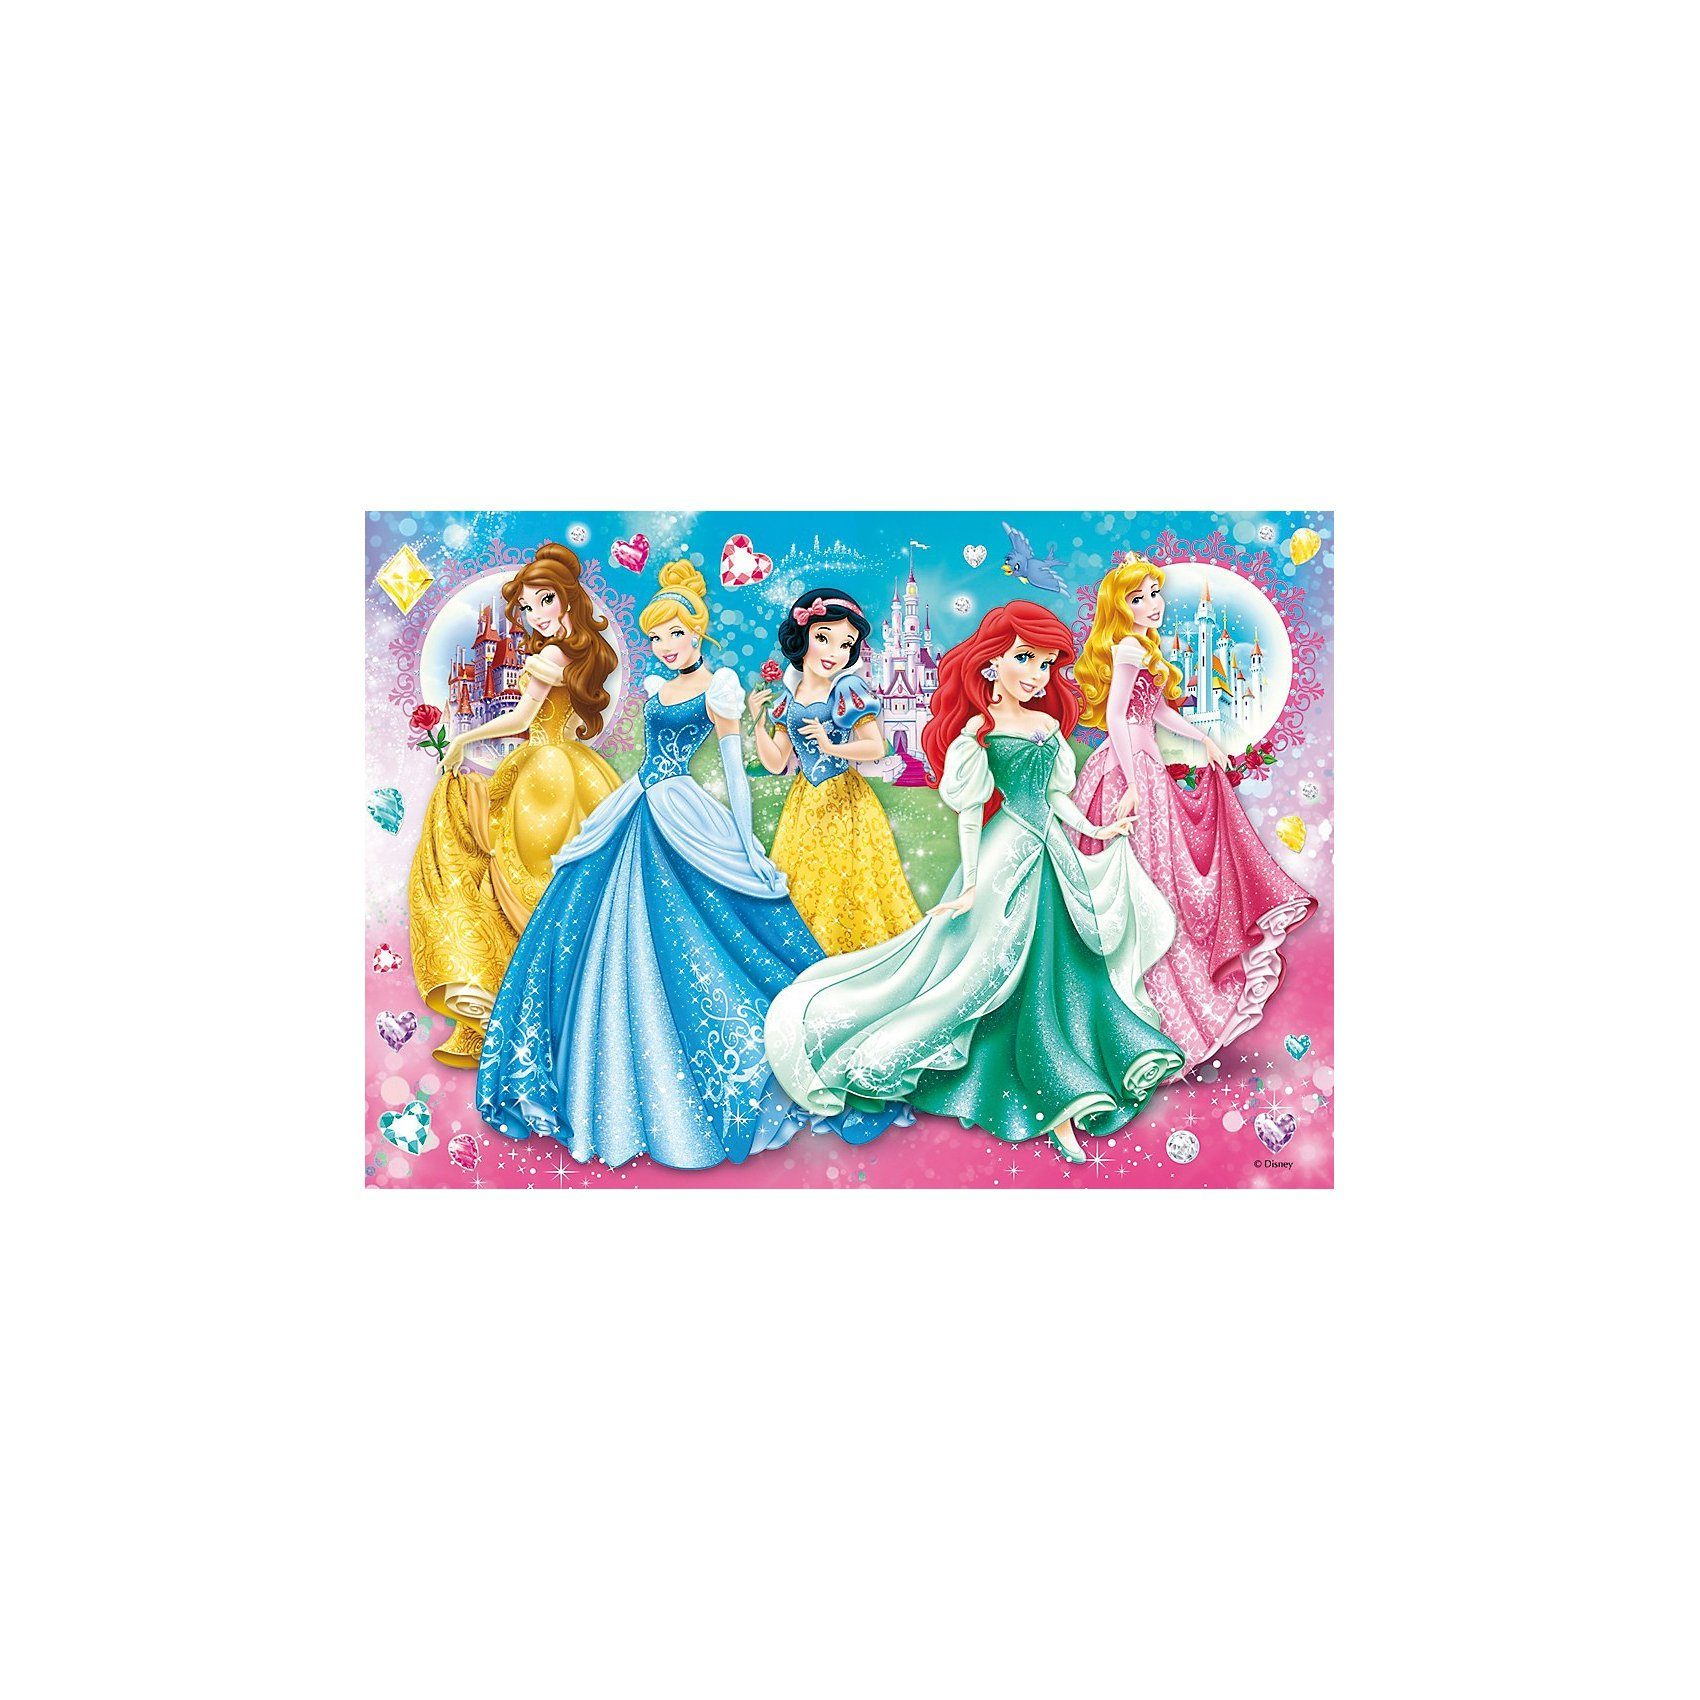 Clementoni Puzzle mit Glitzersteinen - 104 Teile Princess: Twinkled Lad